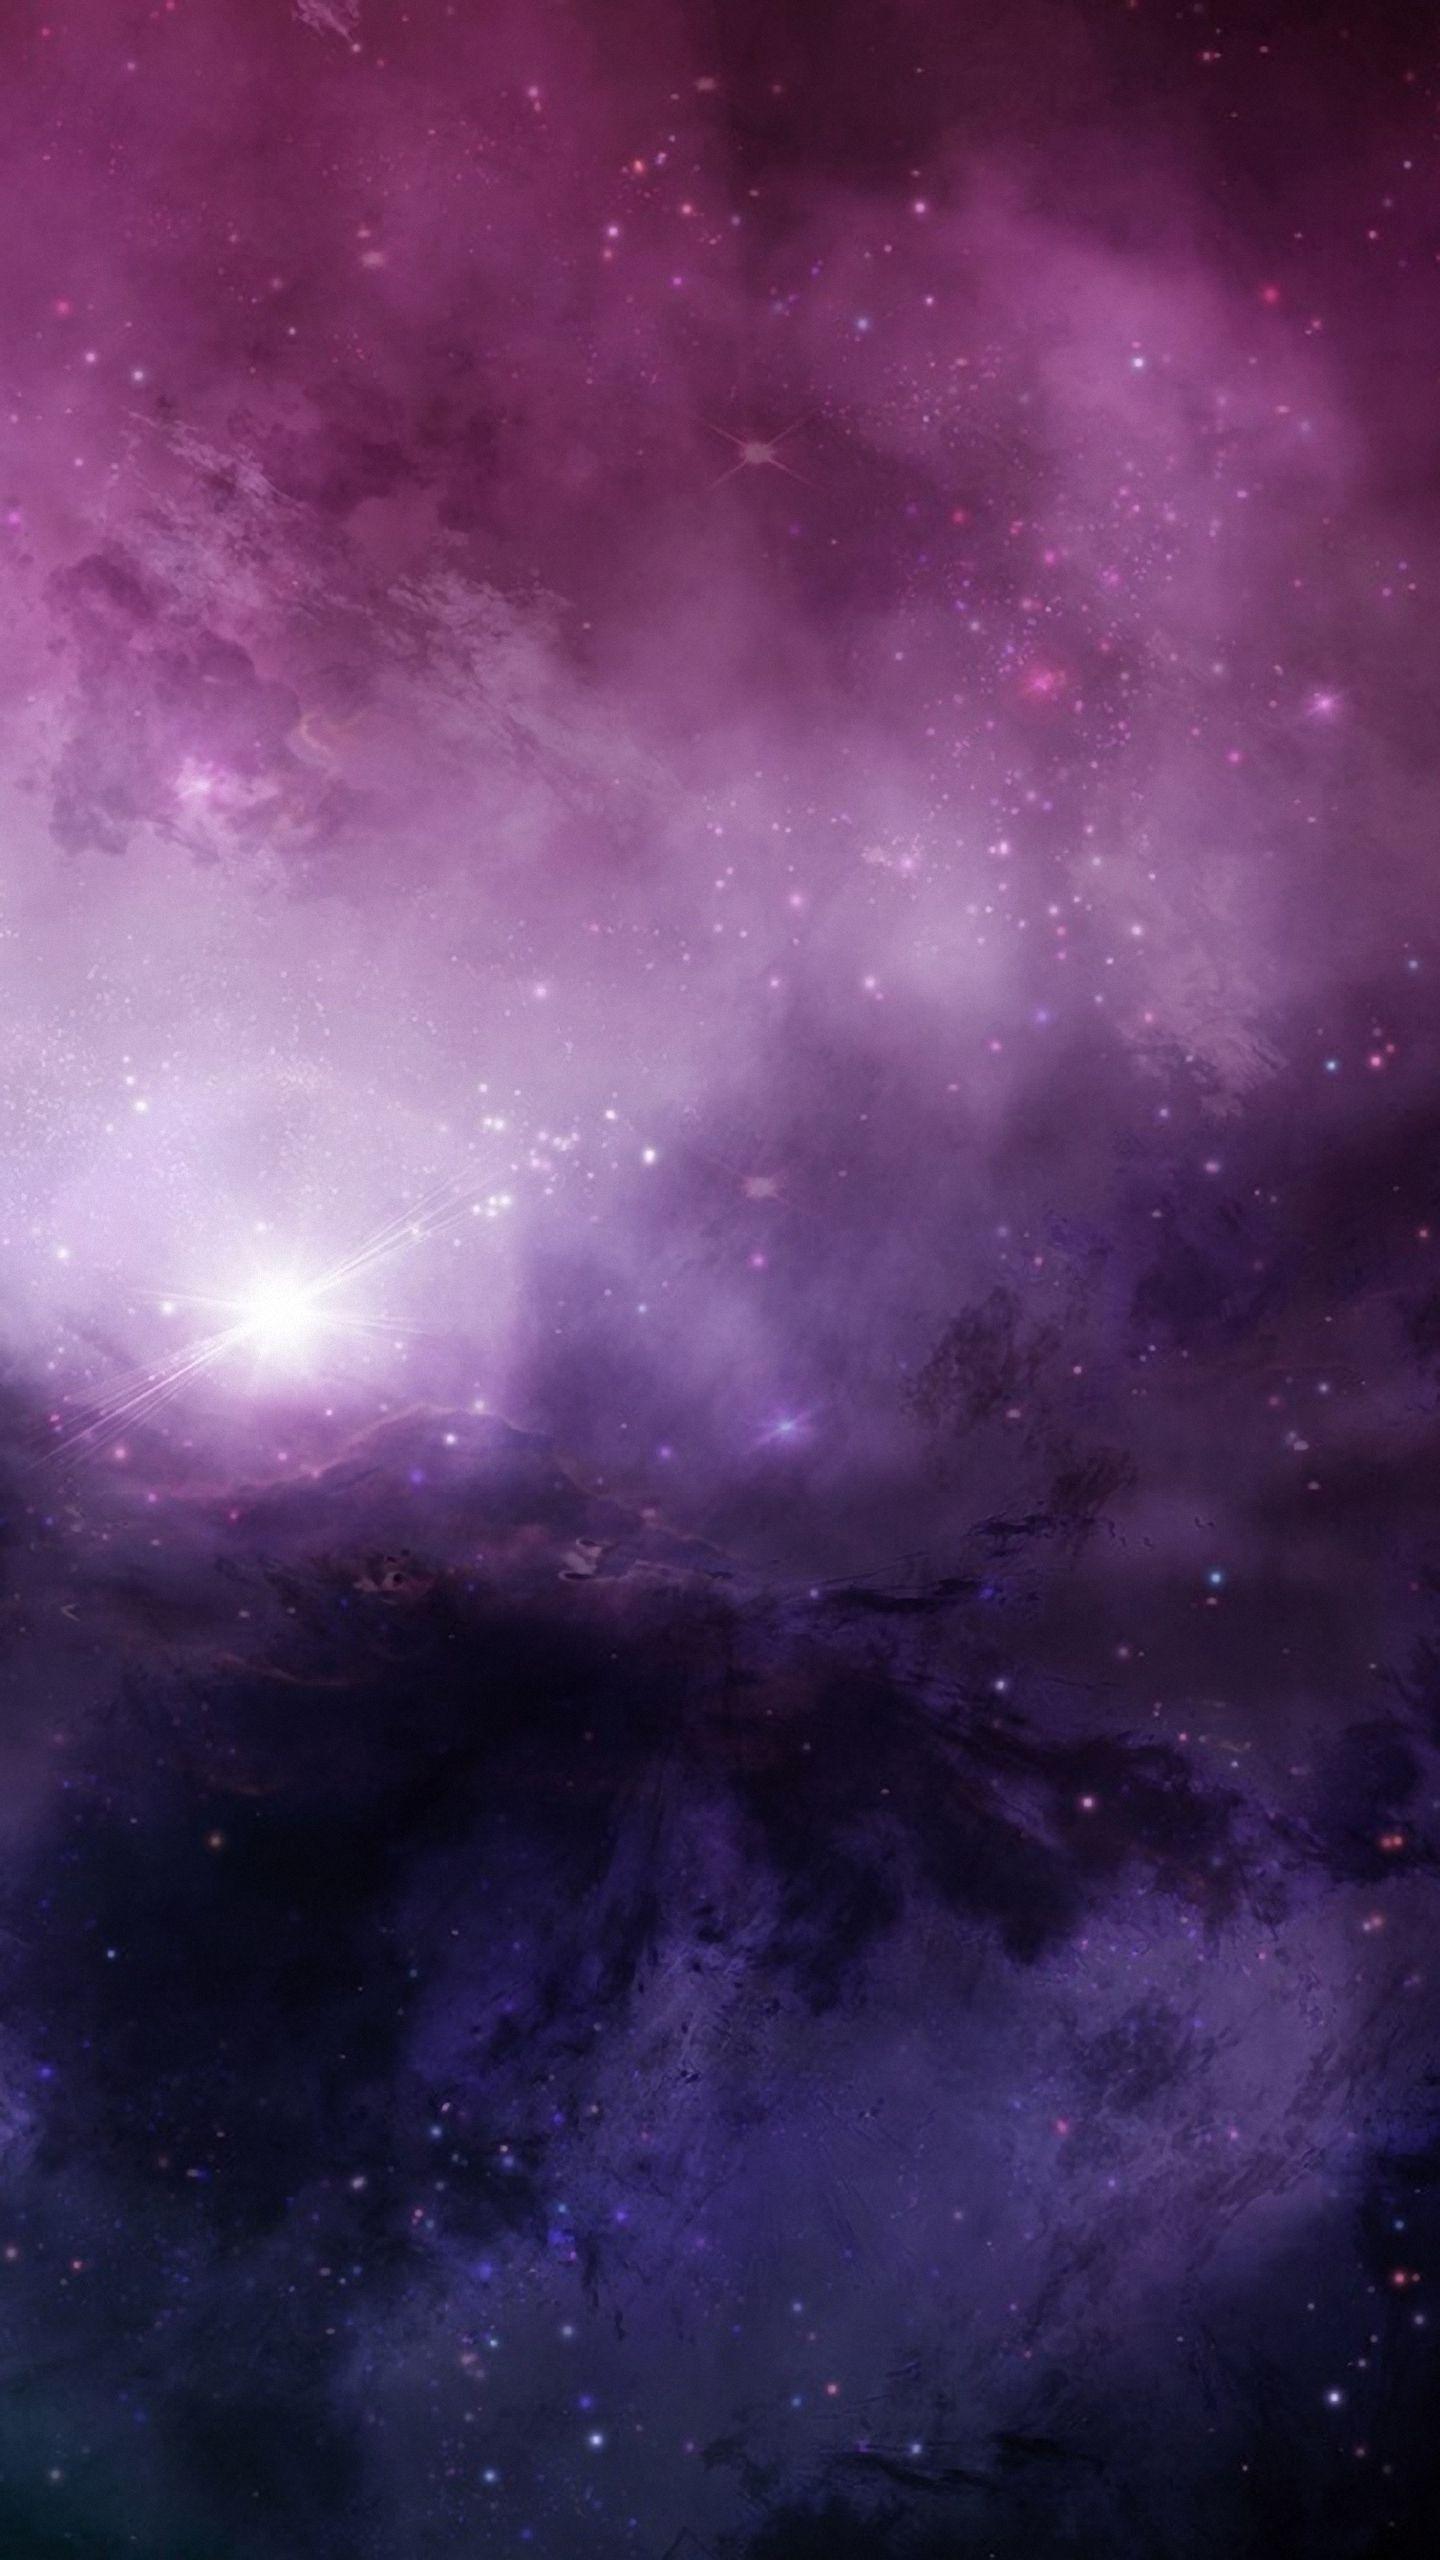 Galaxy S6 Wallpapers HD - WallpaperSafari